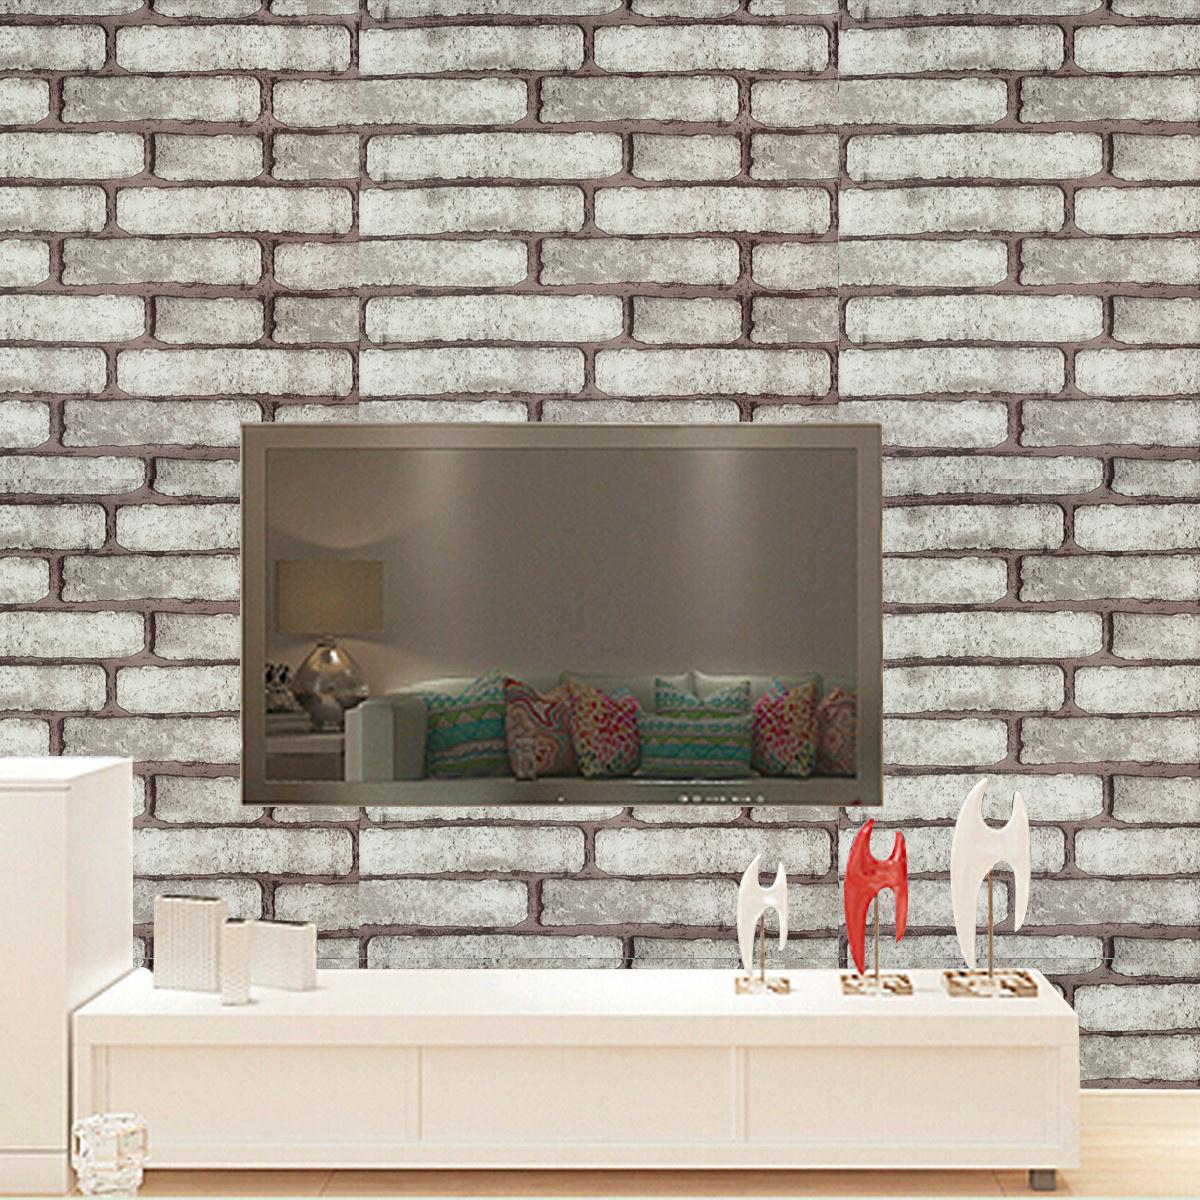 3d brick waterproof wall sticker self adhesive panels for 3d brick wallpaper uk